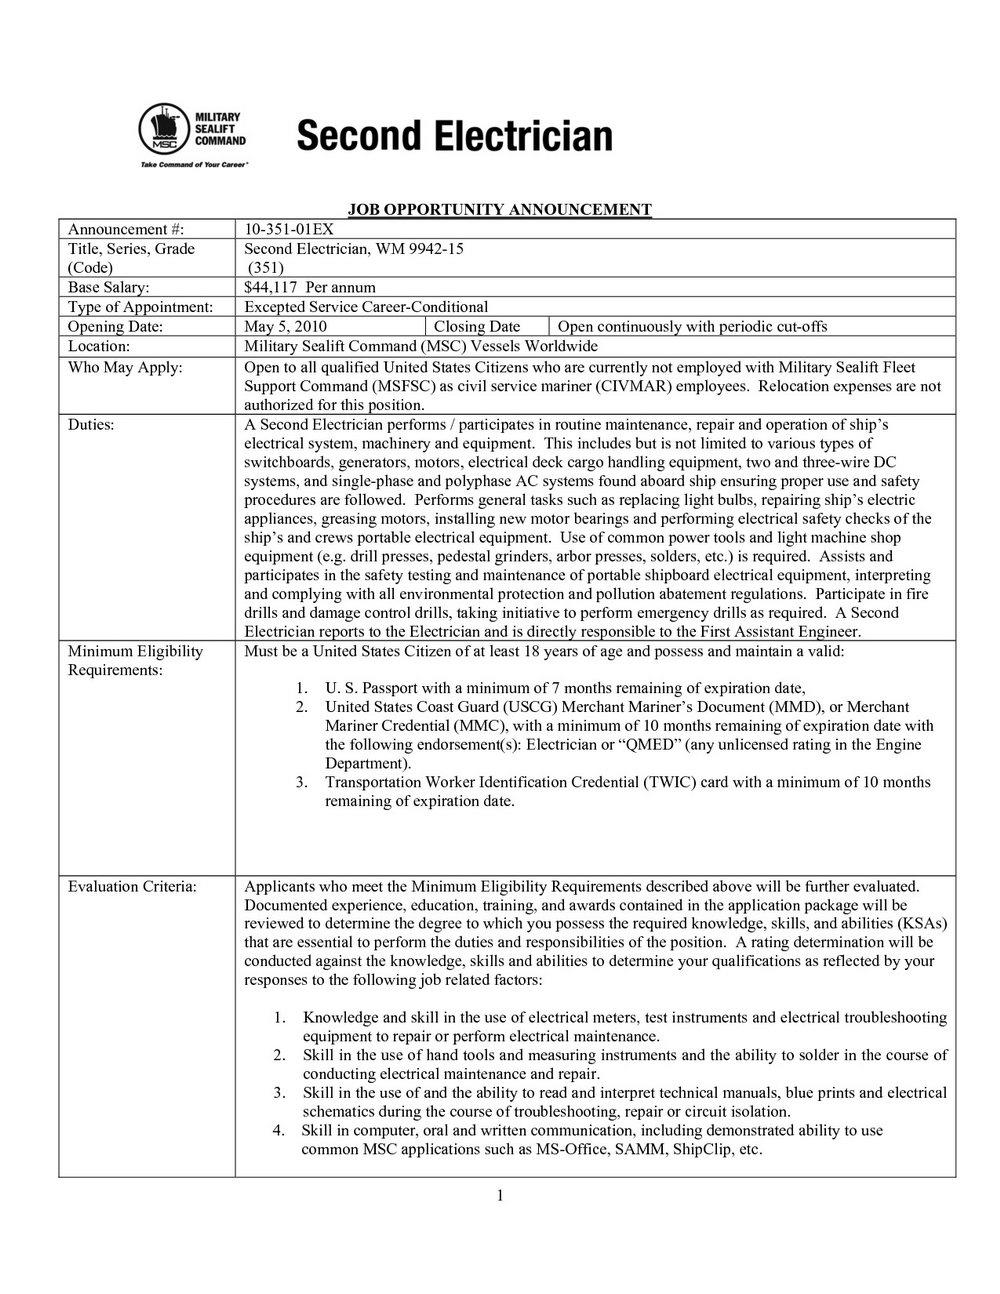 Electrician Job Application